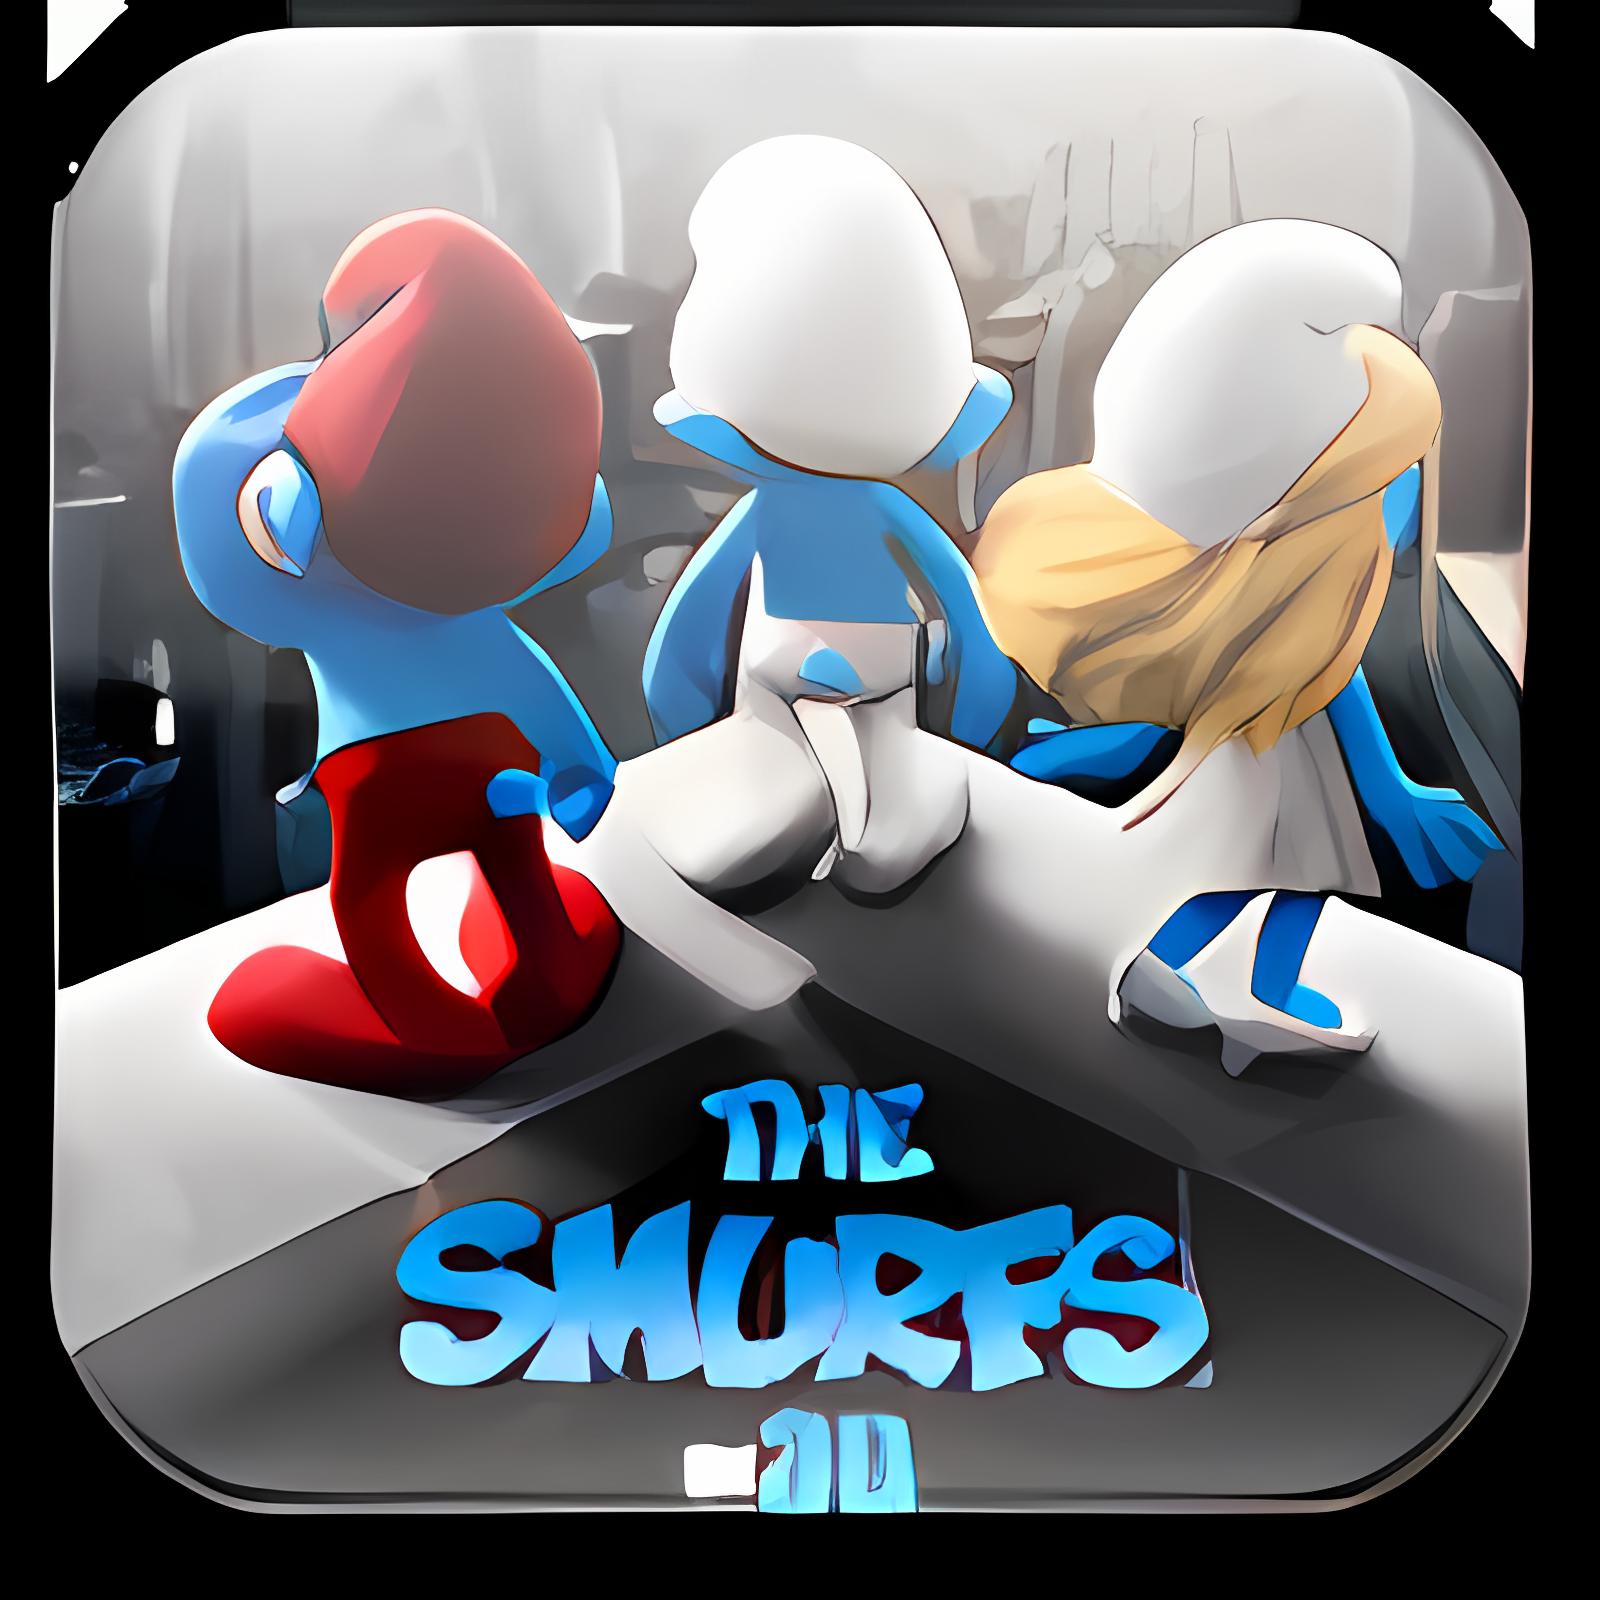 Smurfs 3D Livewallpaper